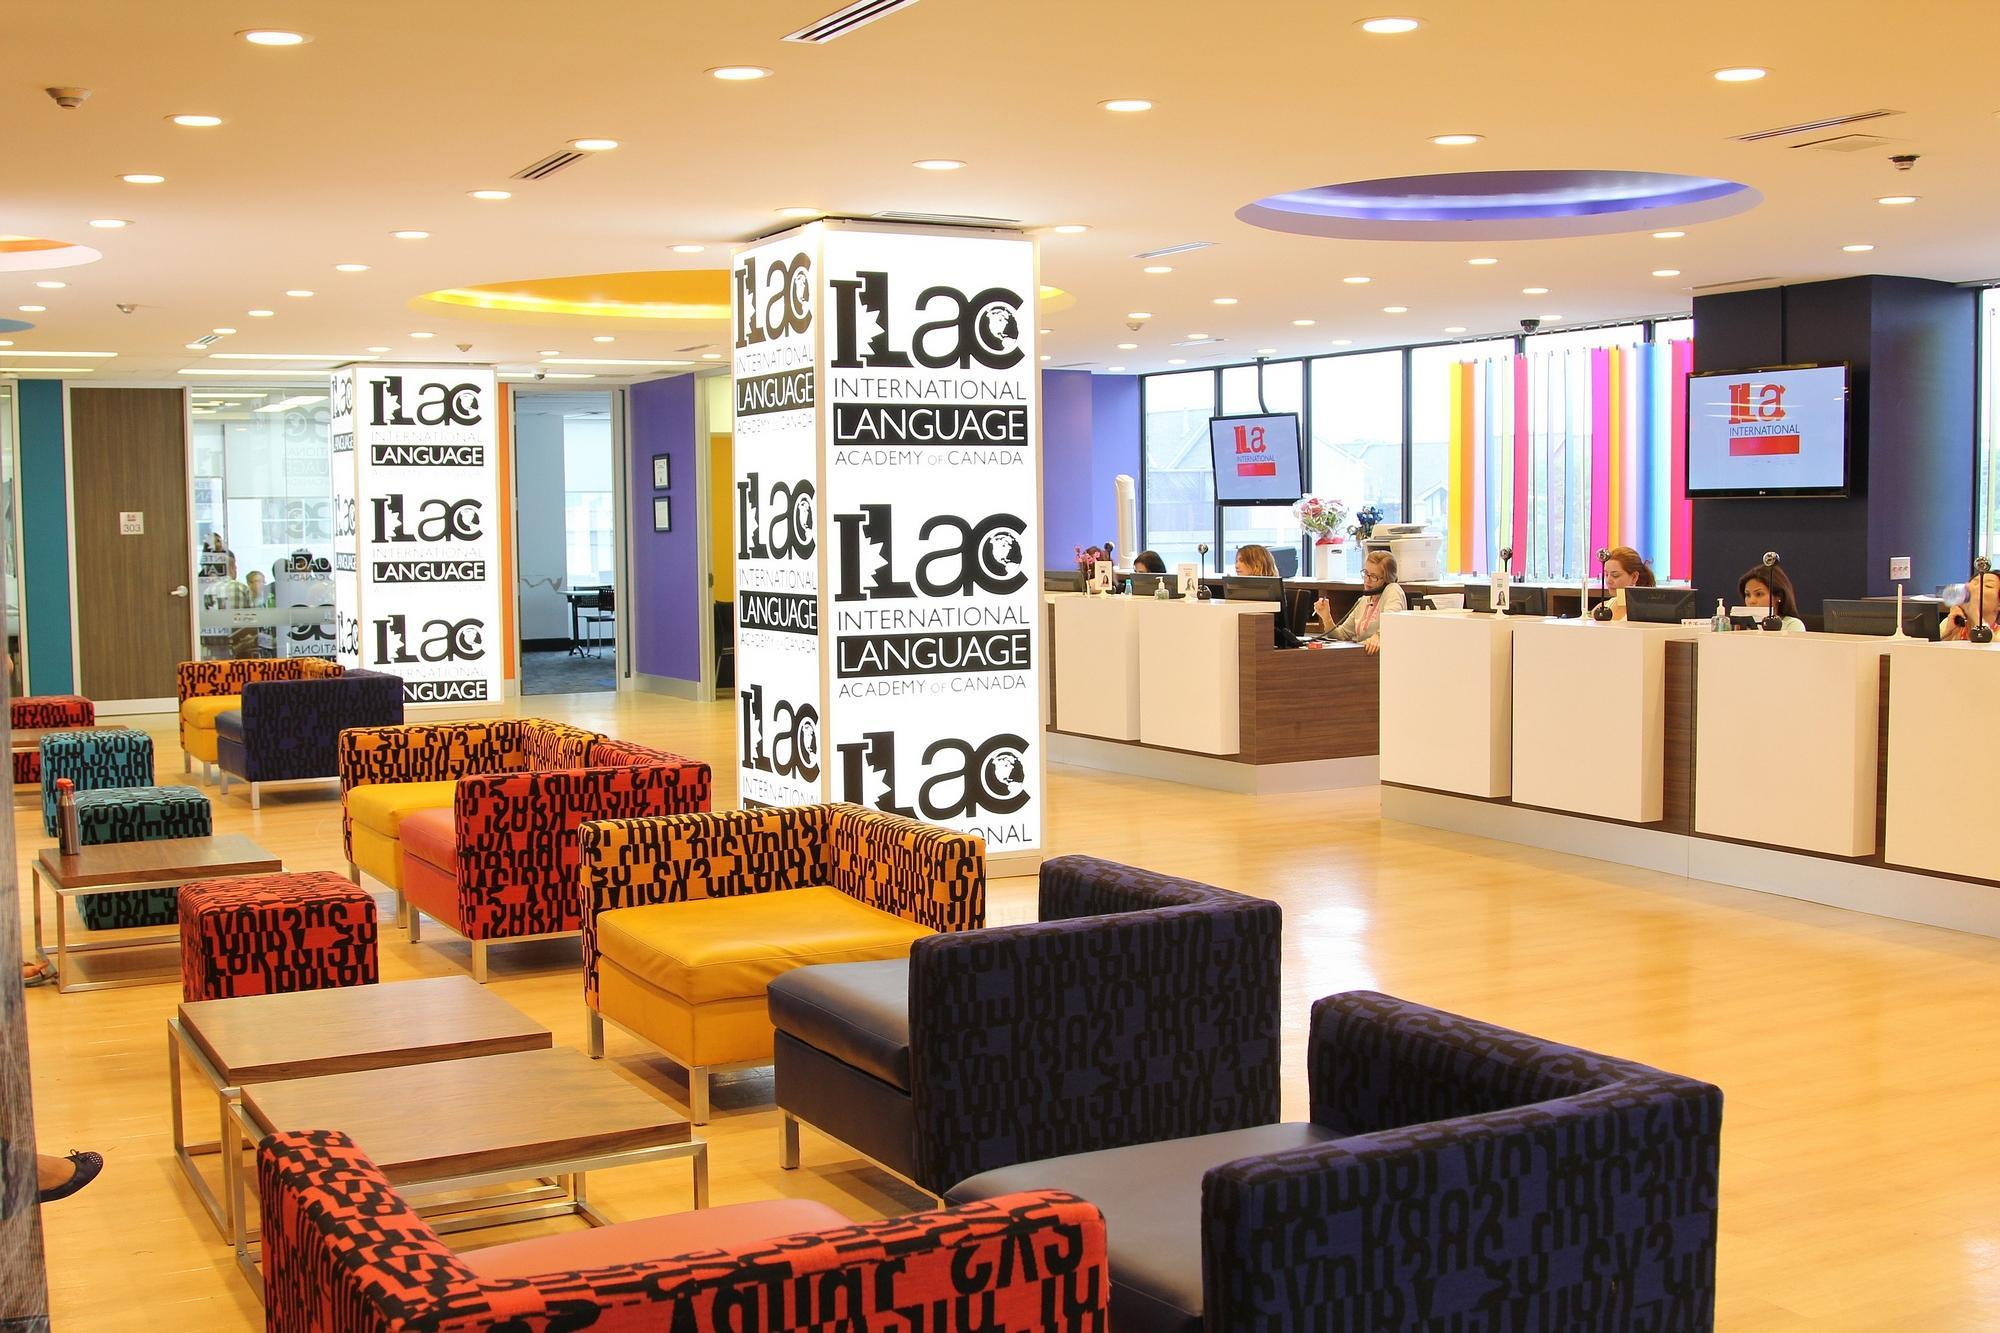 ILAC加拿大国际语言学院在线英语培训课程 我在ILAC7个月的真实学习体验 85